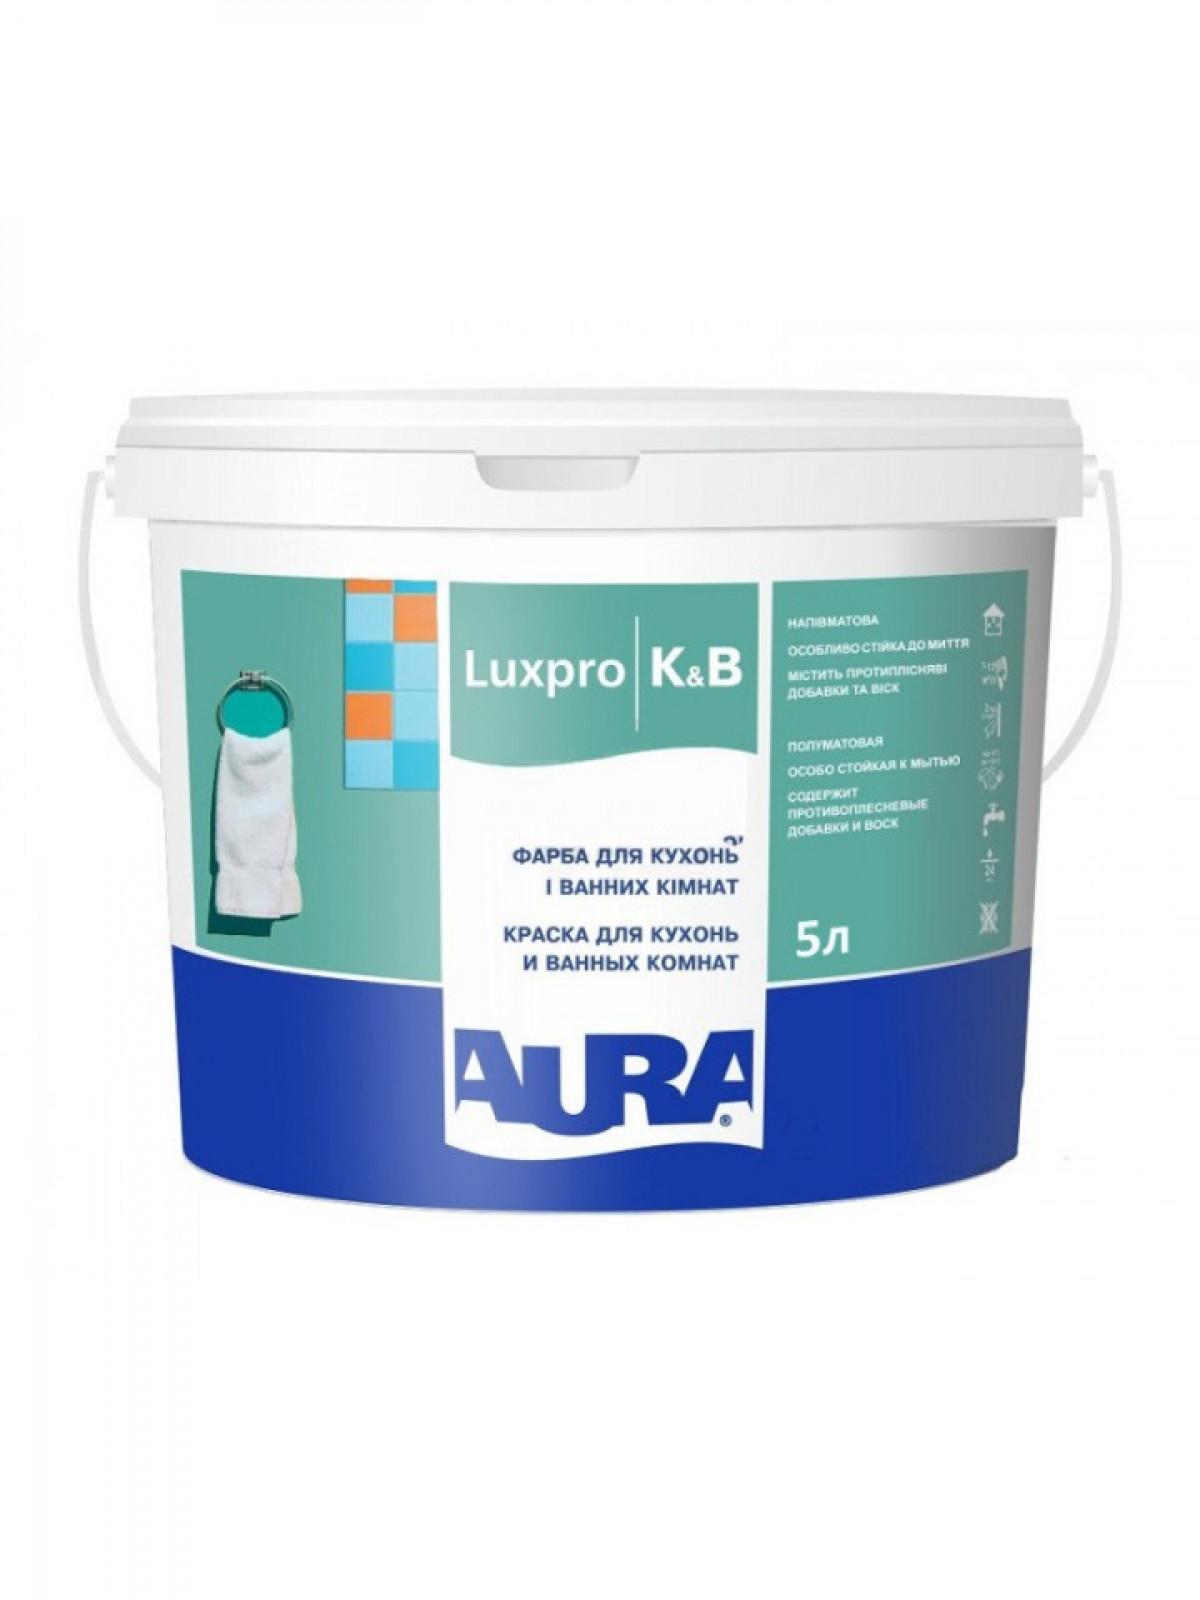 Фарба латексна AURA LUX PRO KB для вологих приміщень